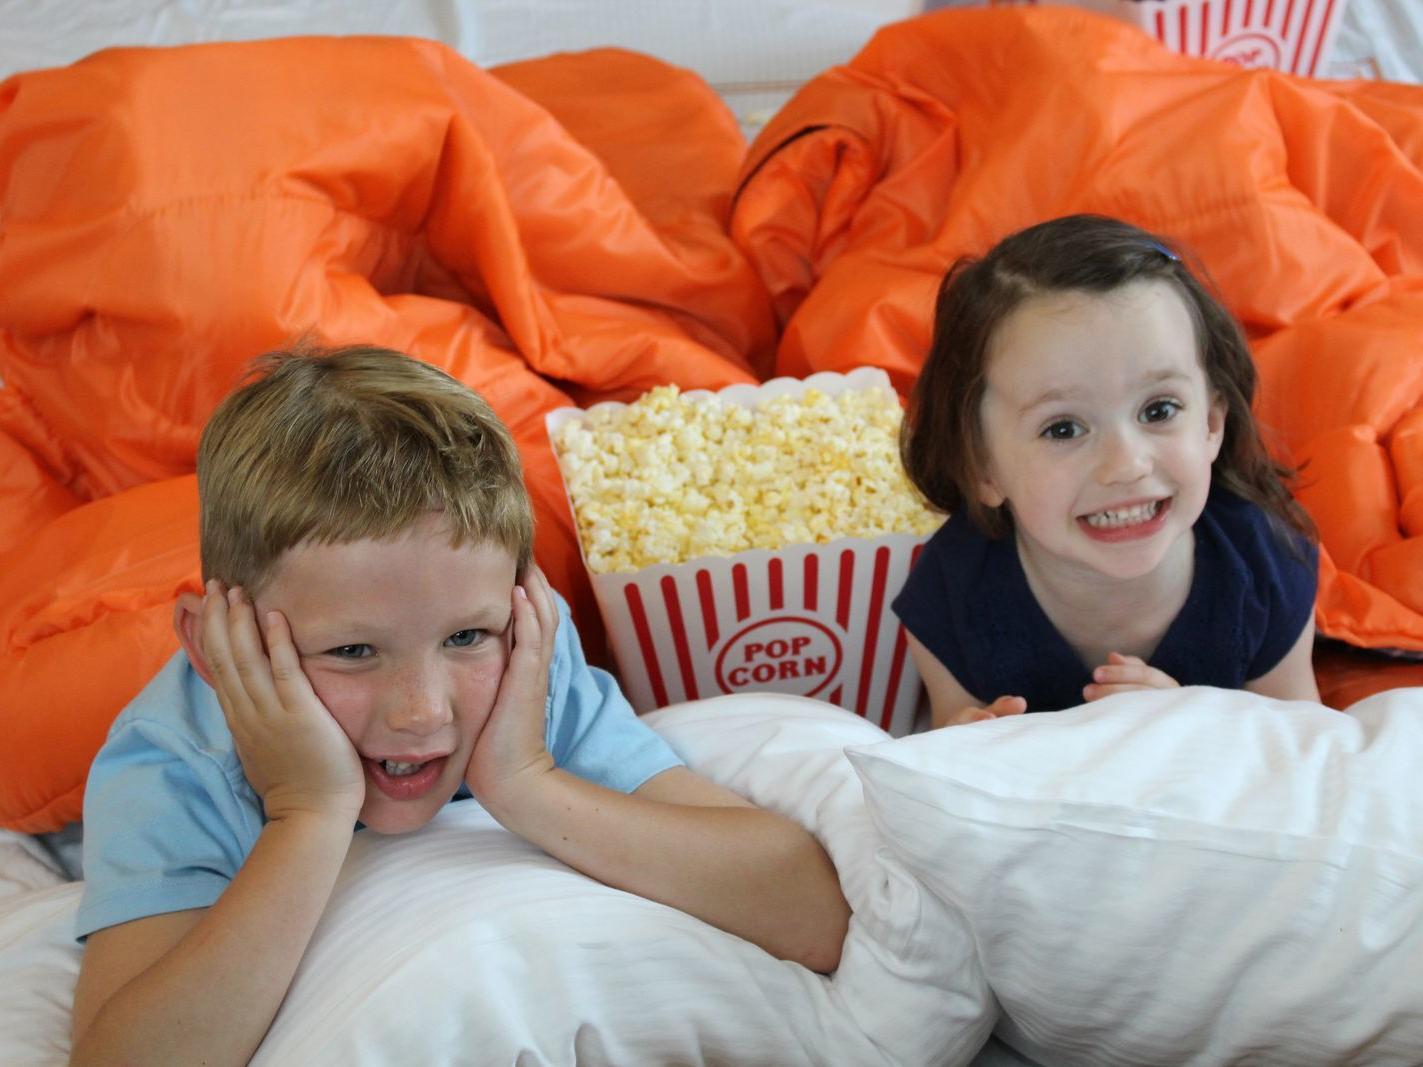 two children eating popcorn